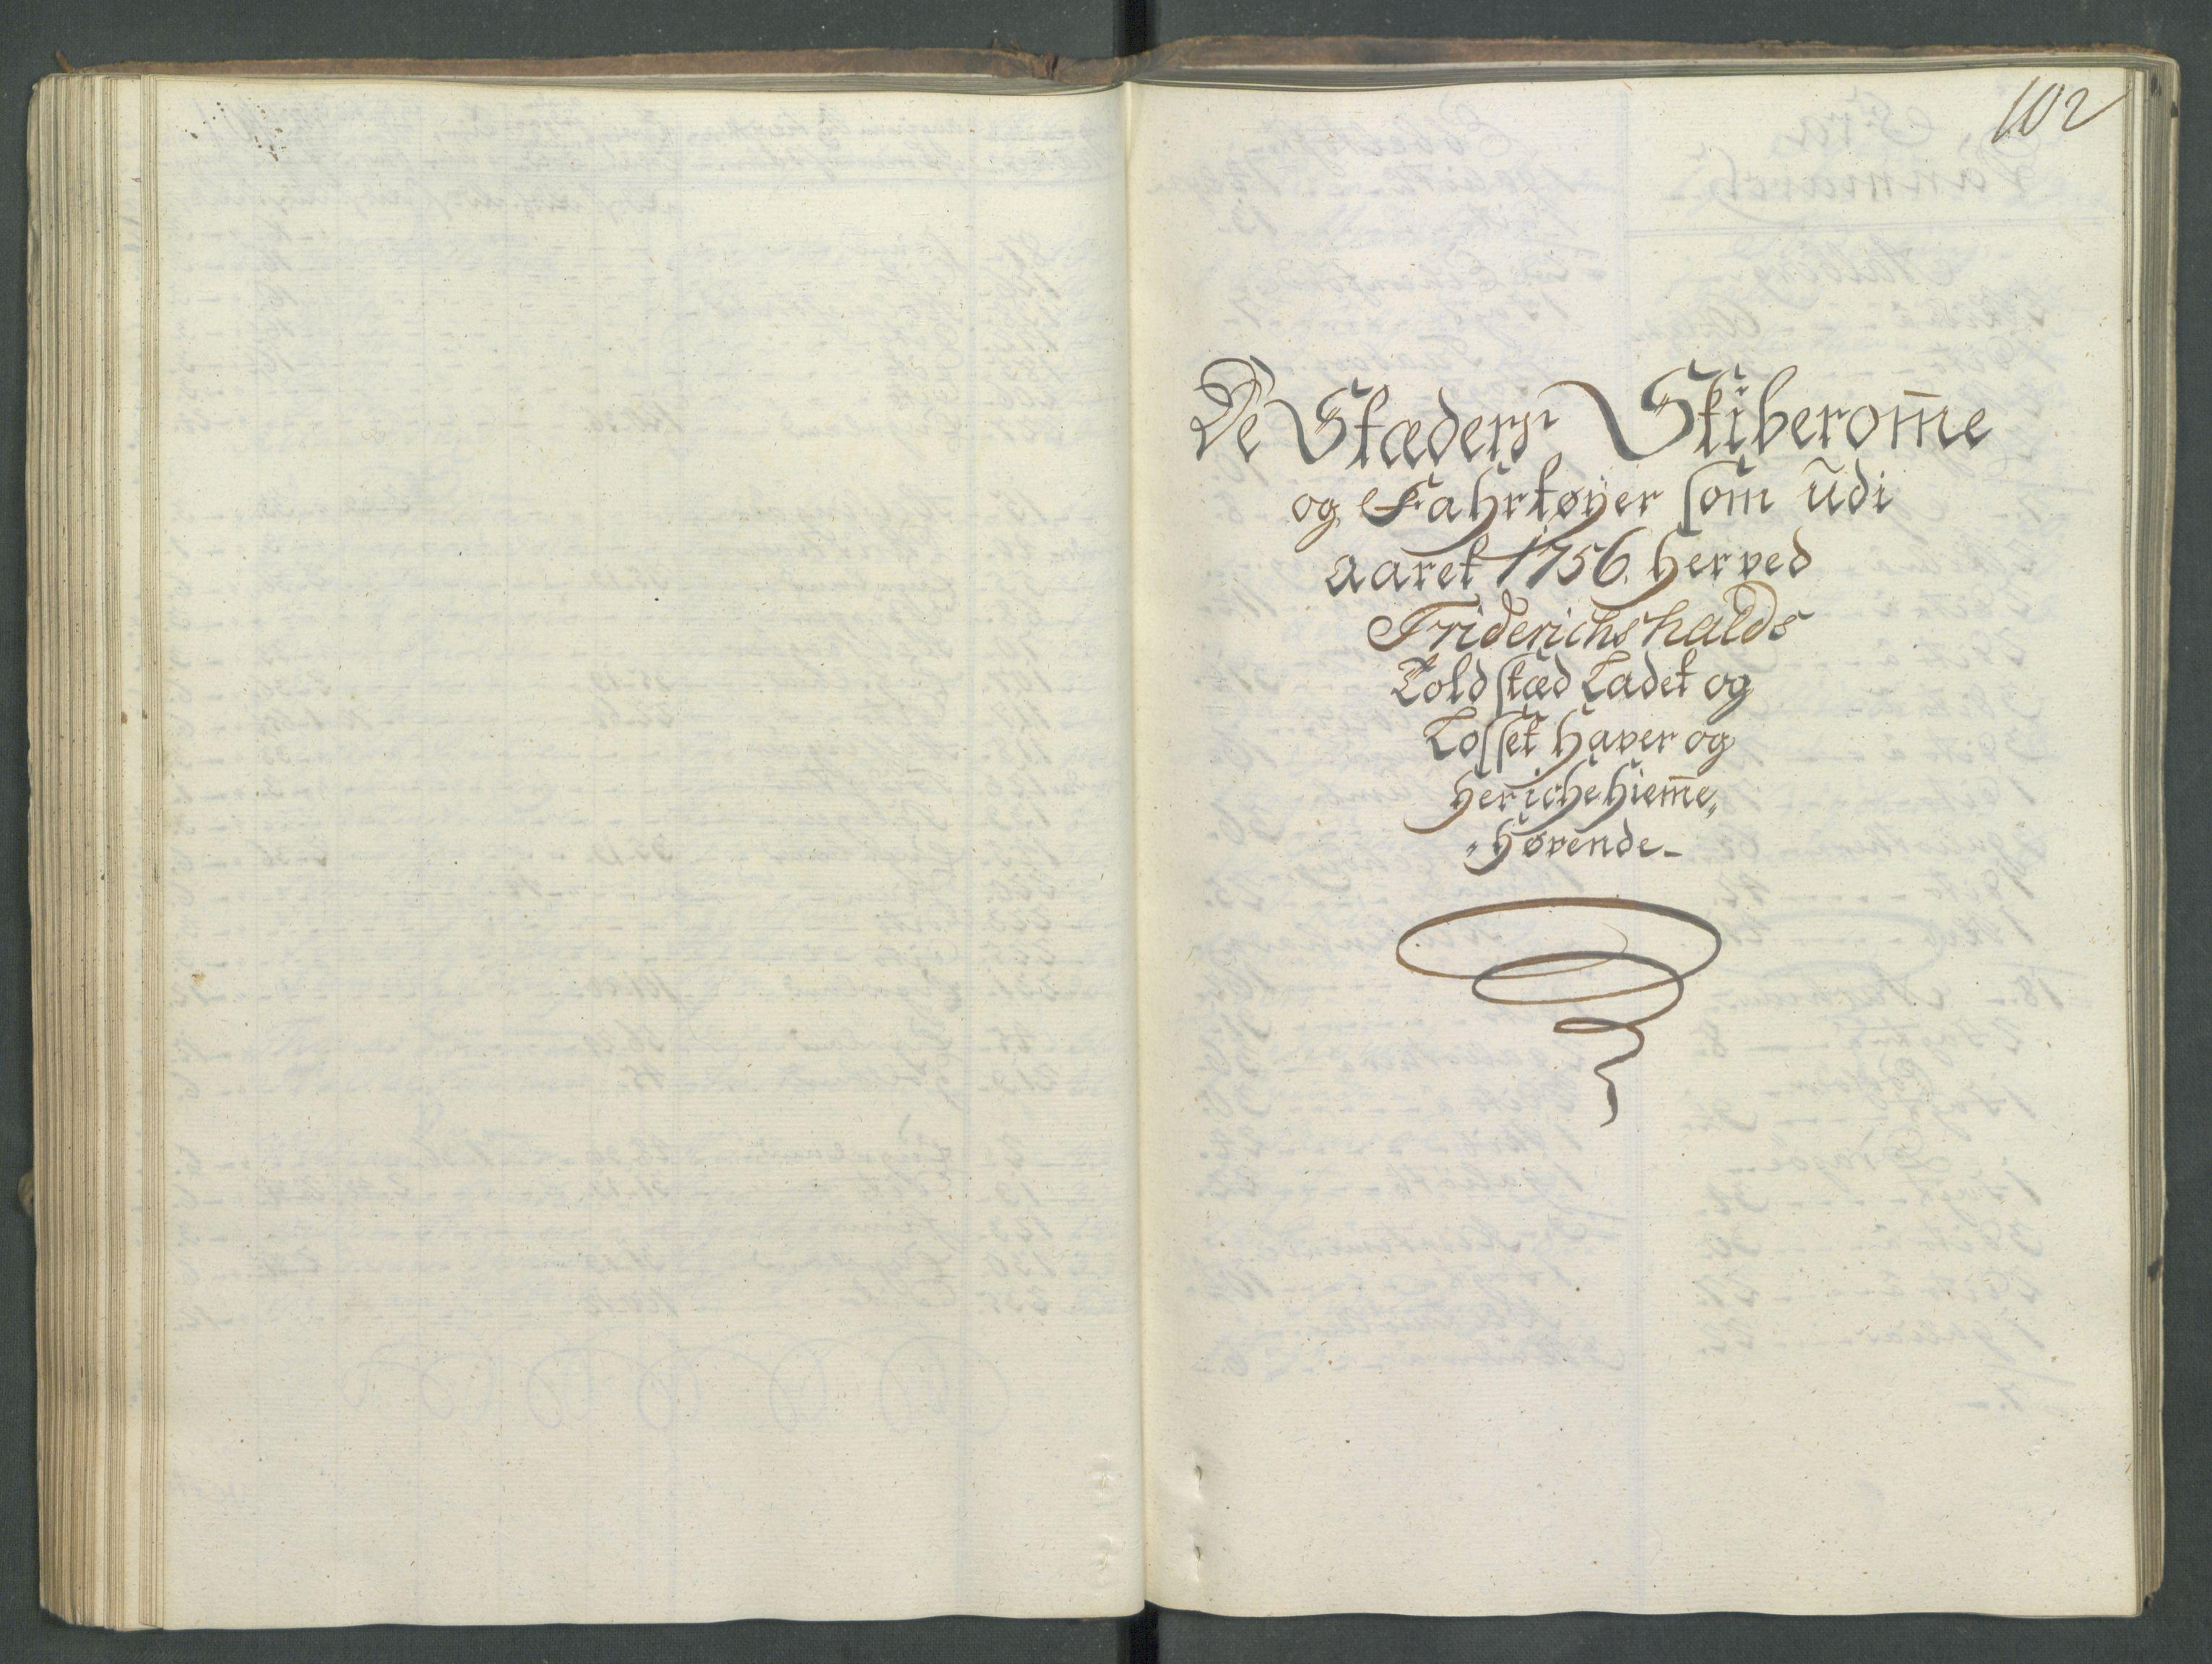 RA, Generaltollkammeret, tollregnskaper, R01/L0029: Tollregnskaper Fredrikshald, 1756, s. 101b-102a